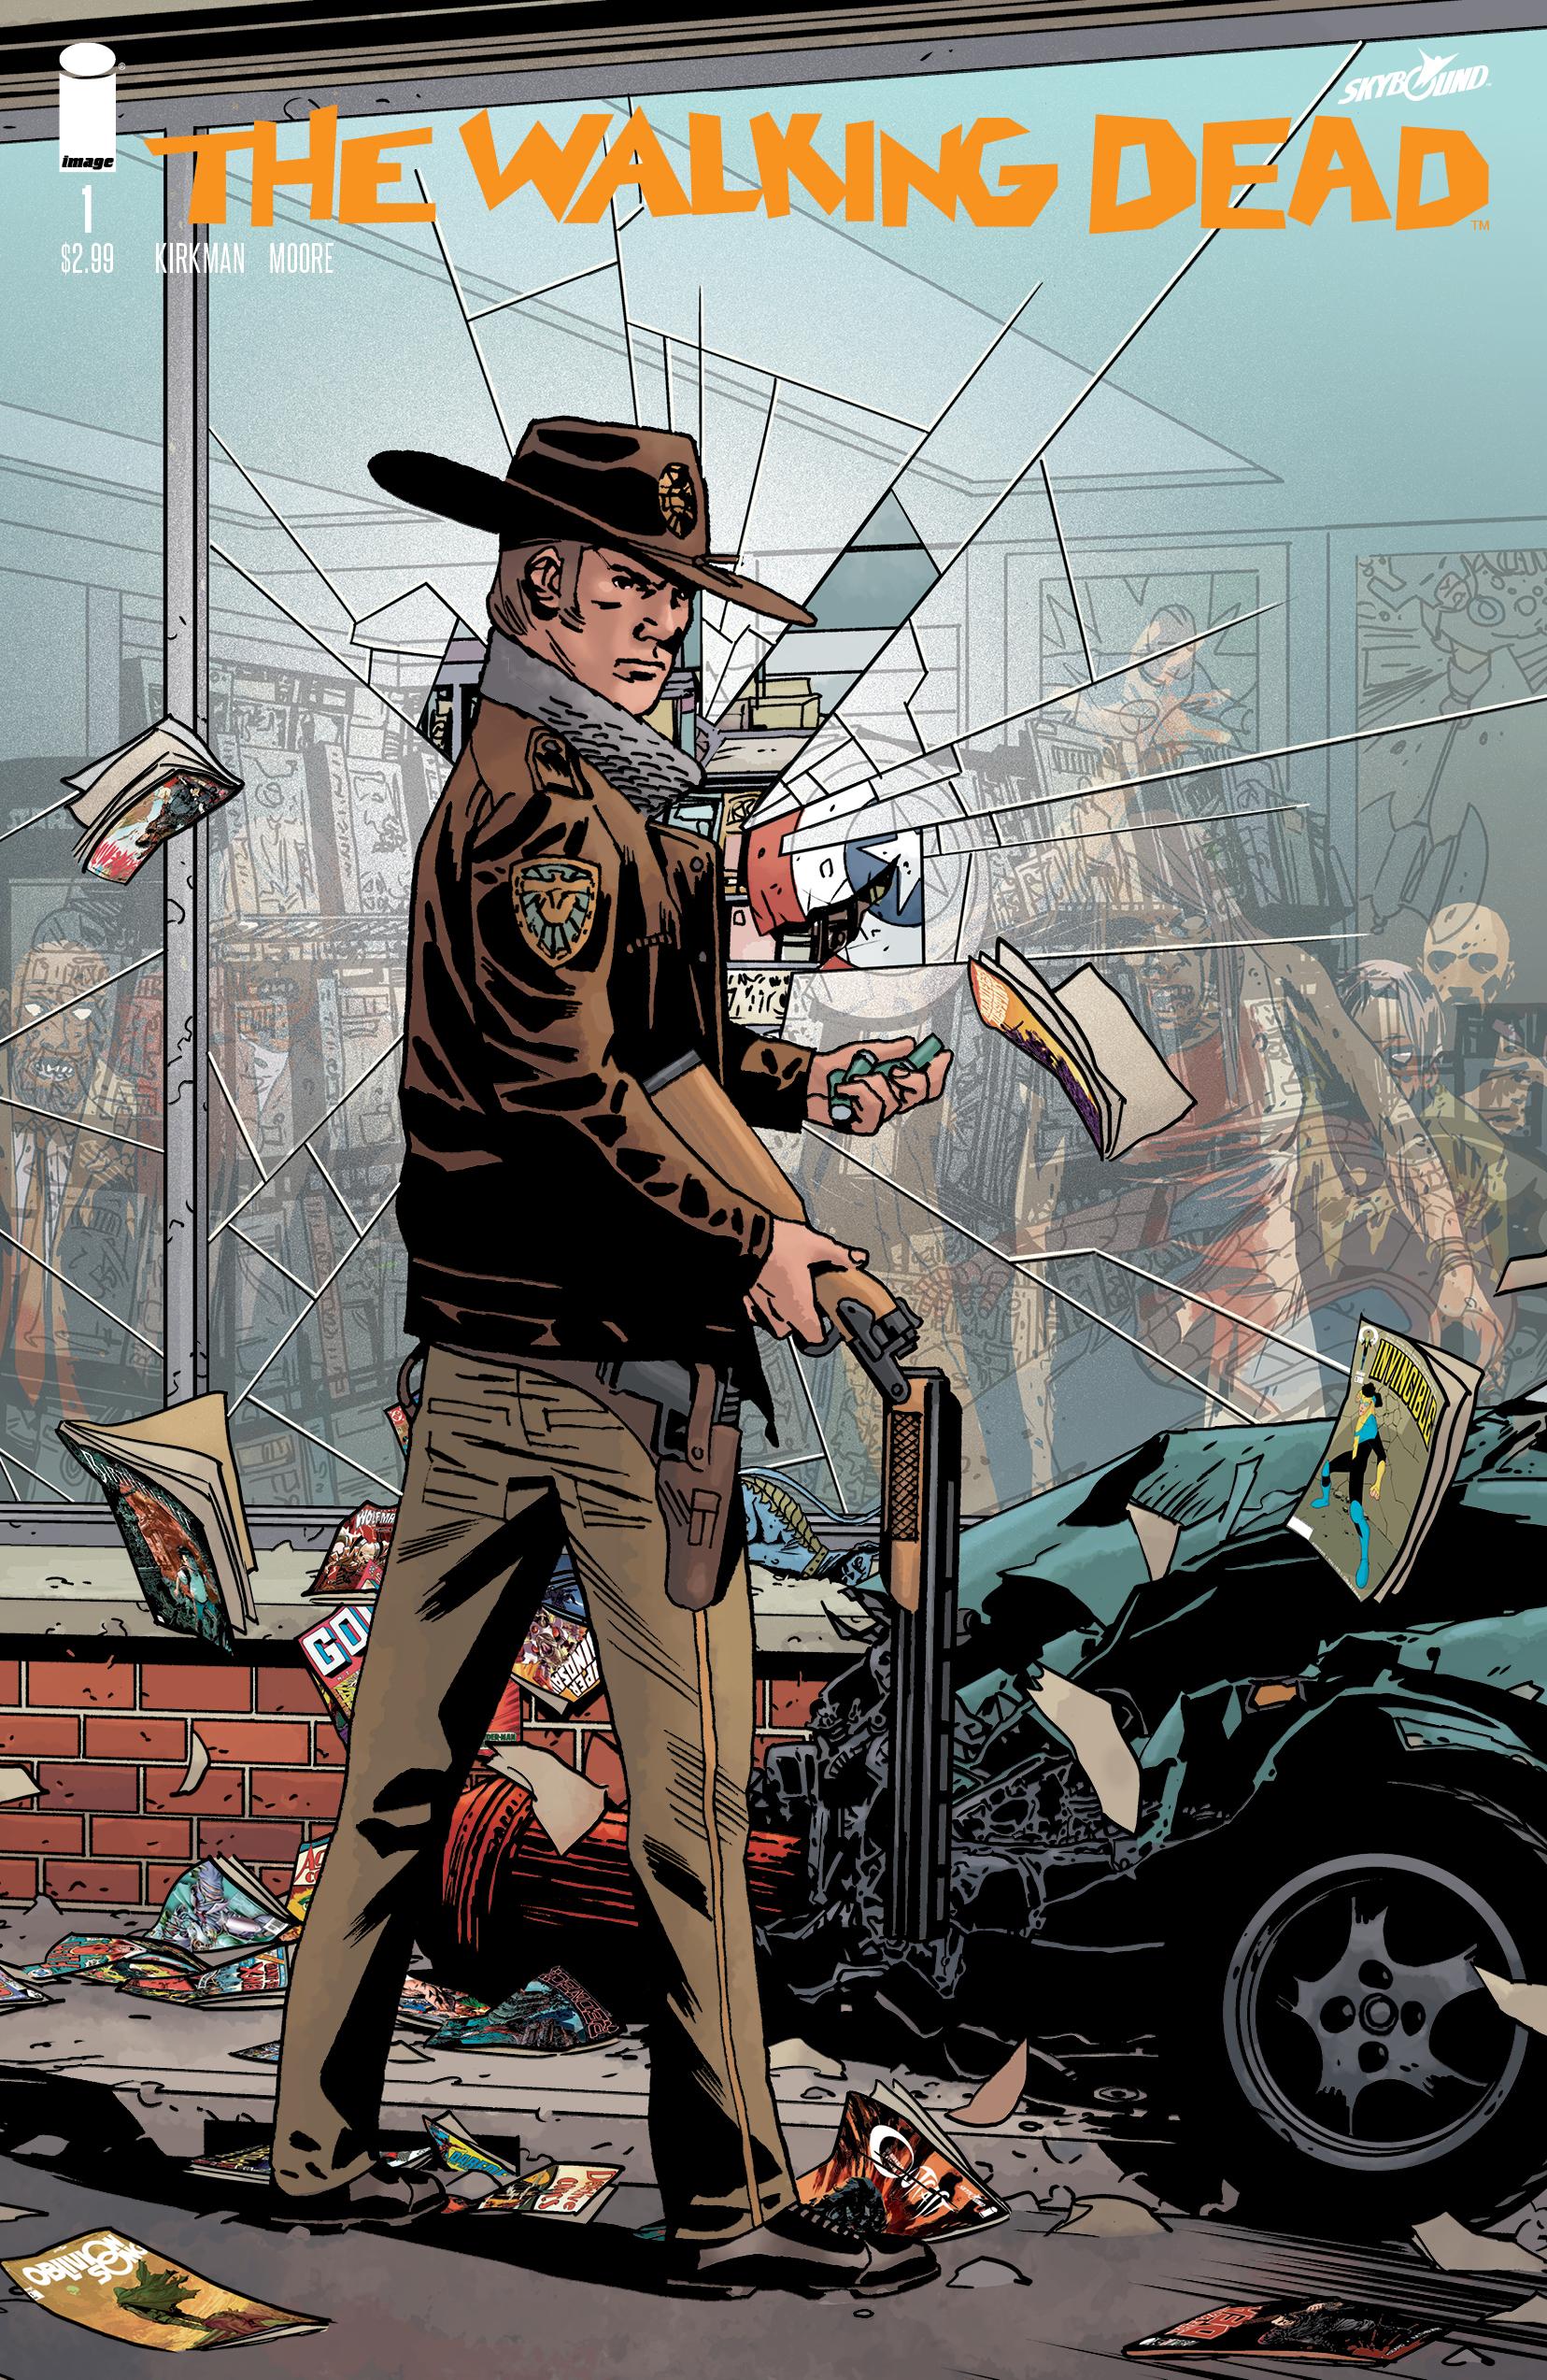 The Walking Dead #1 15th Anniversary Retailer Edition